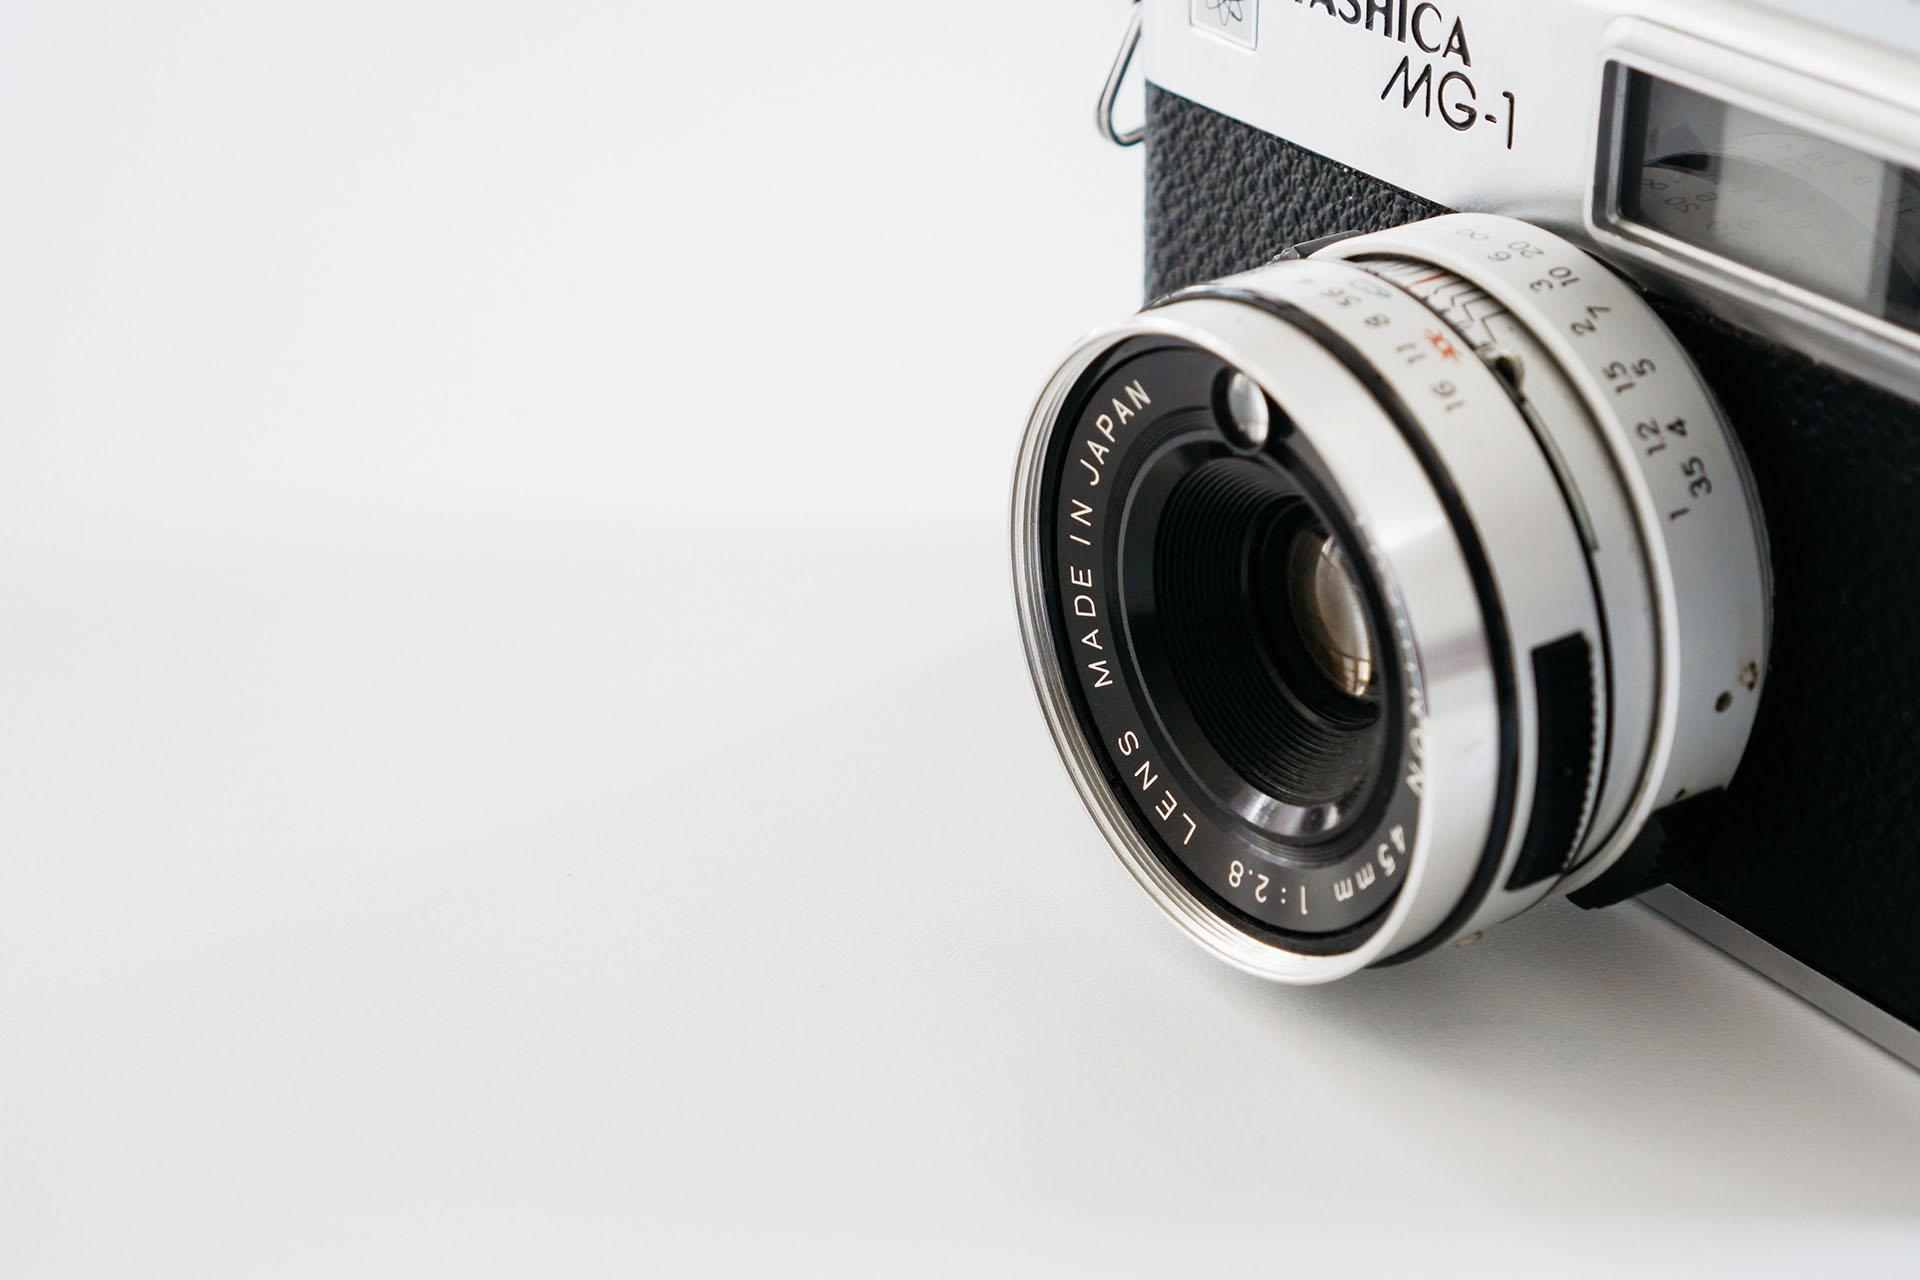 vintage-camera-mirrorless-amoserfotografo-cameras-mirrorless-todo-sobre